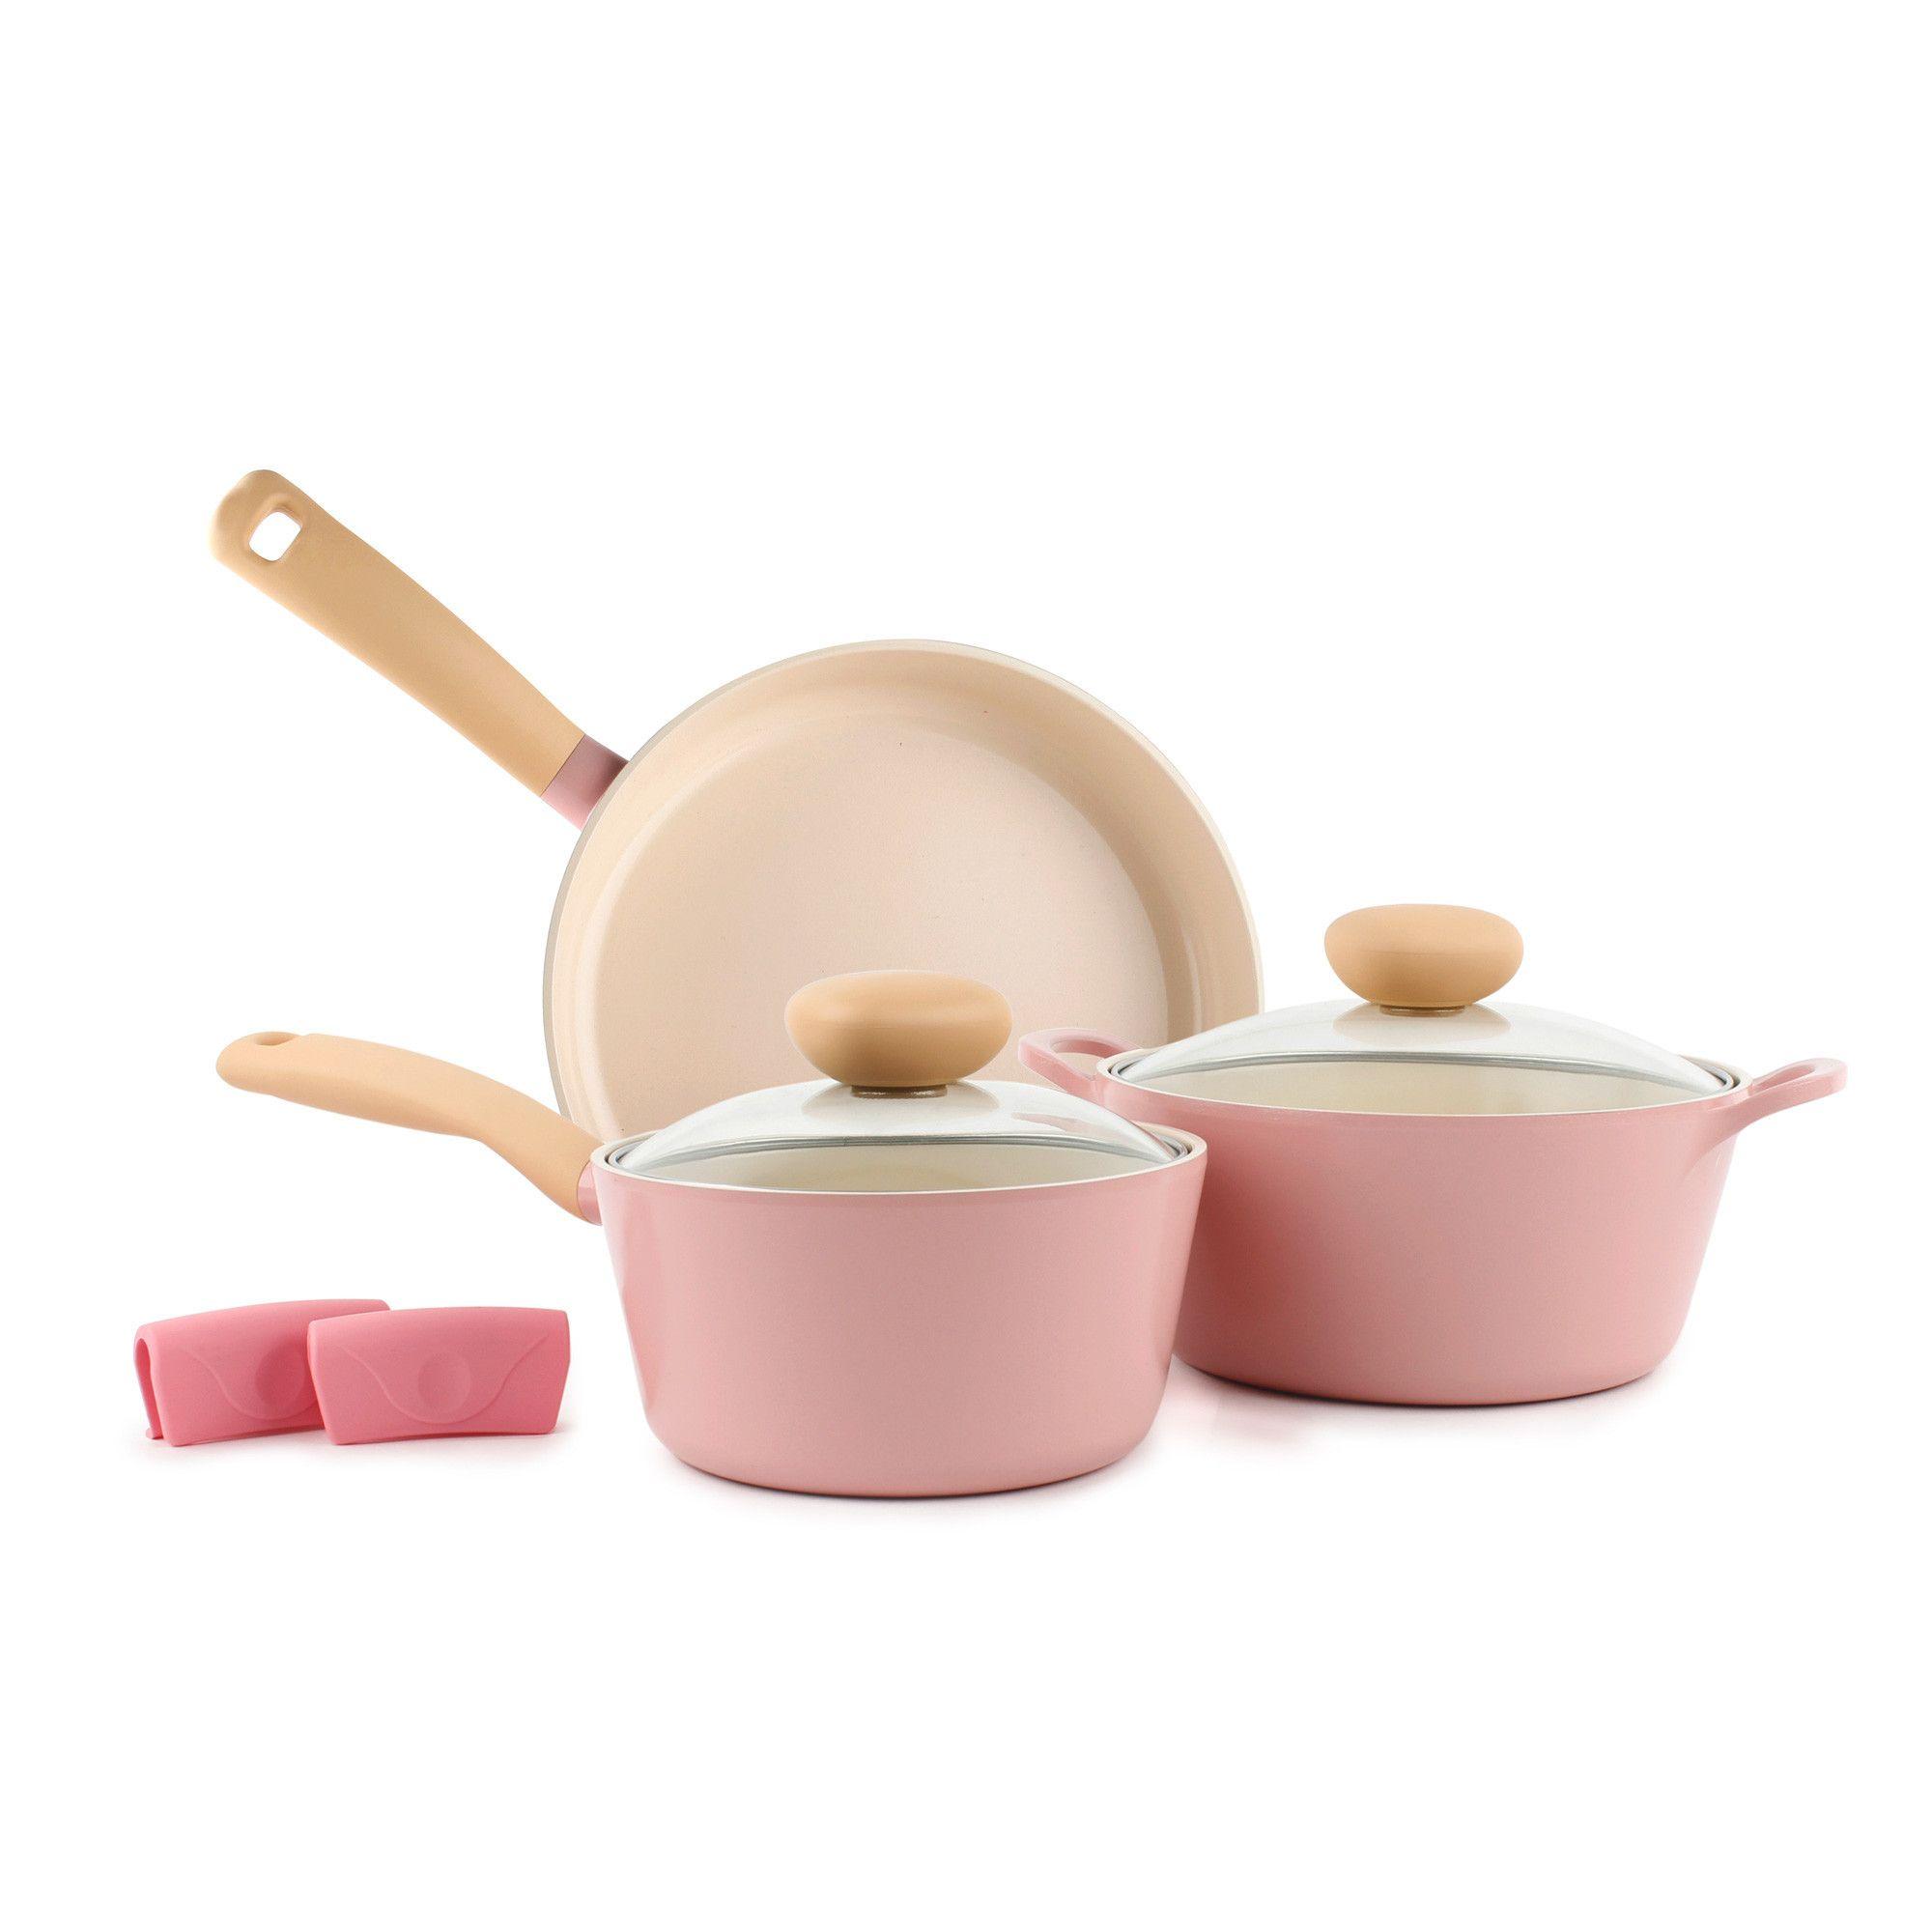 Retro 5 Piece Ceramic Nonstick Cookware Set In Pink In 2020